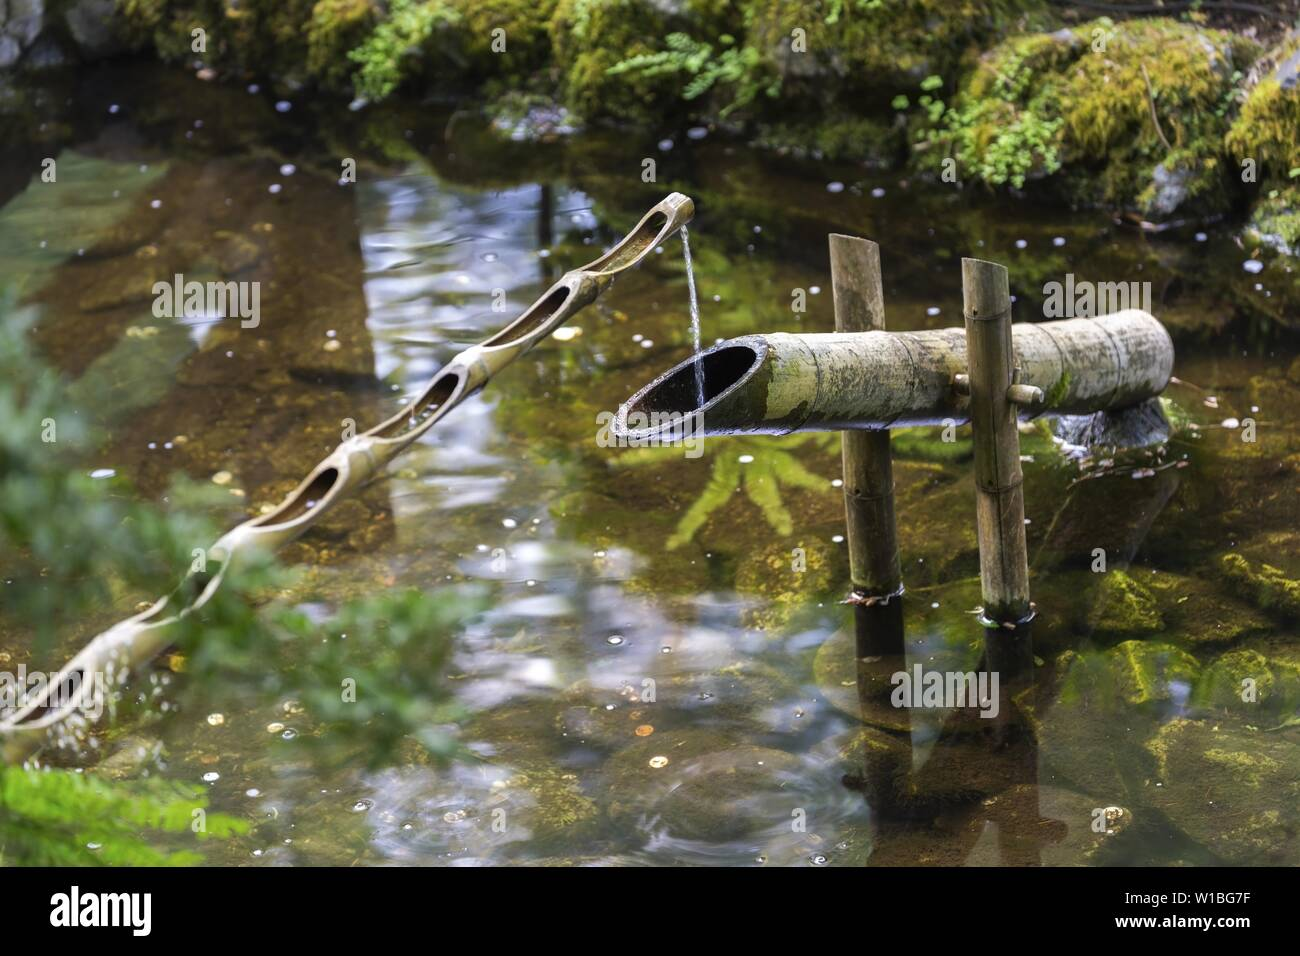 water-spilling-in-japanese-garden-pond-f